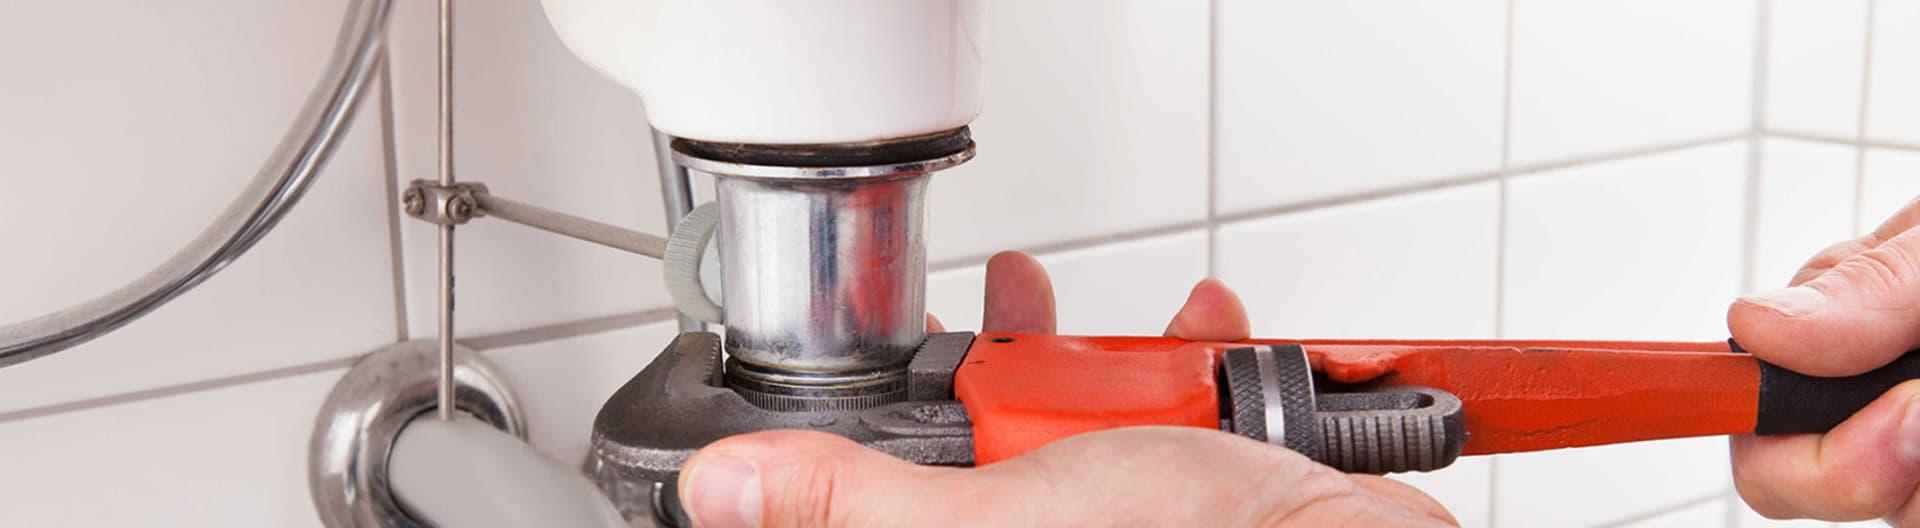 Plumbing Maintenance and Repairs - Sharp Plumbing Services Wanganui